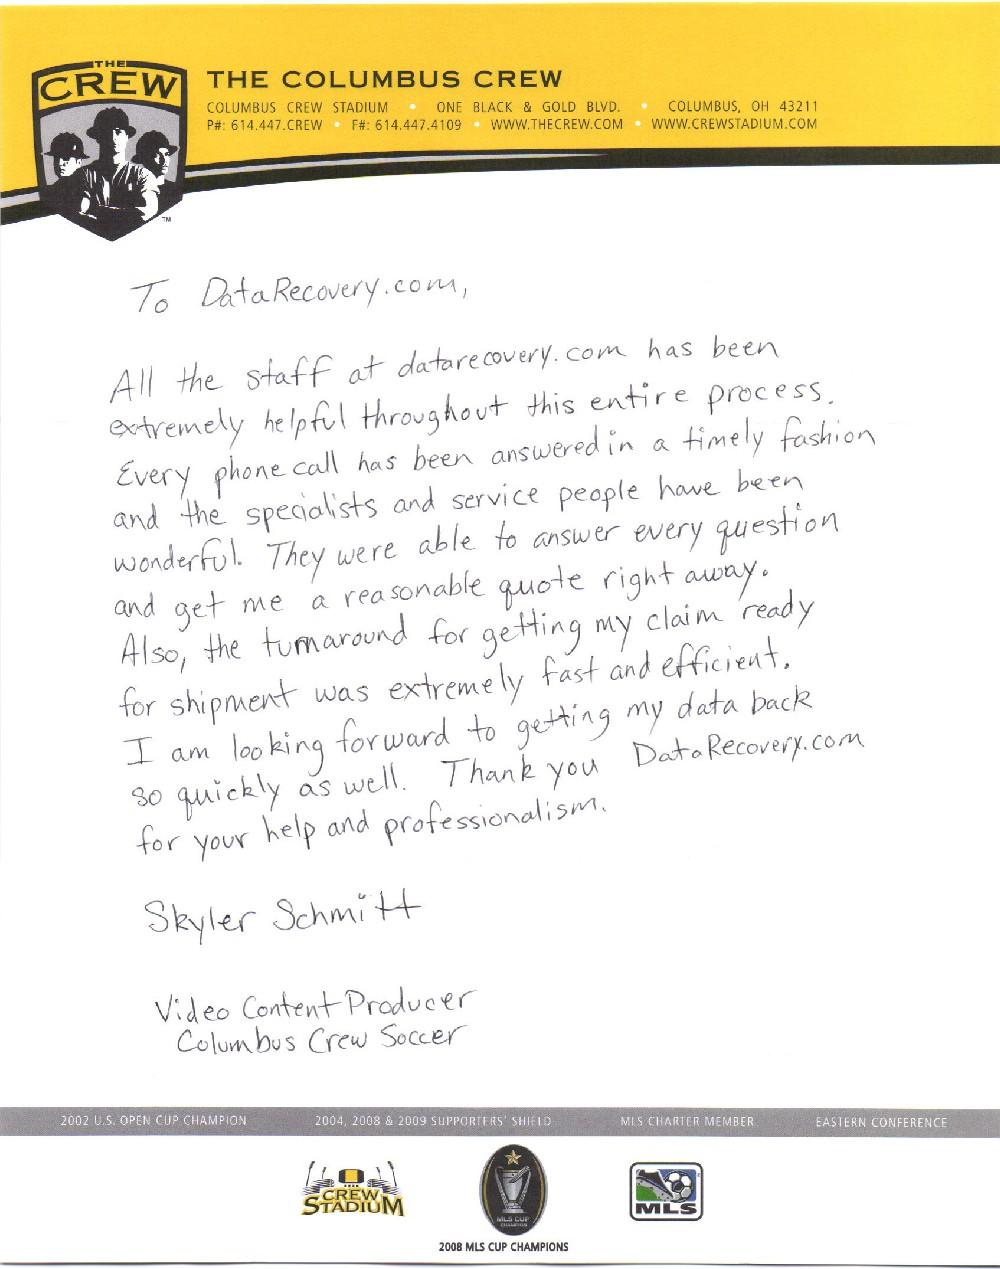 Columbus Crew Soccer testimonial